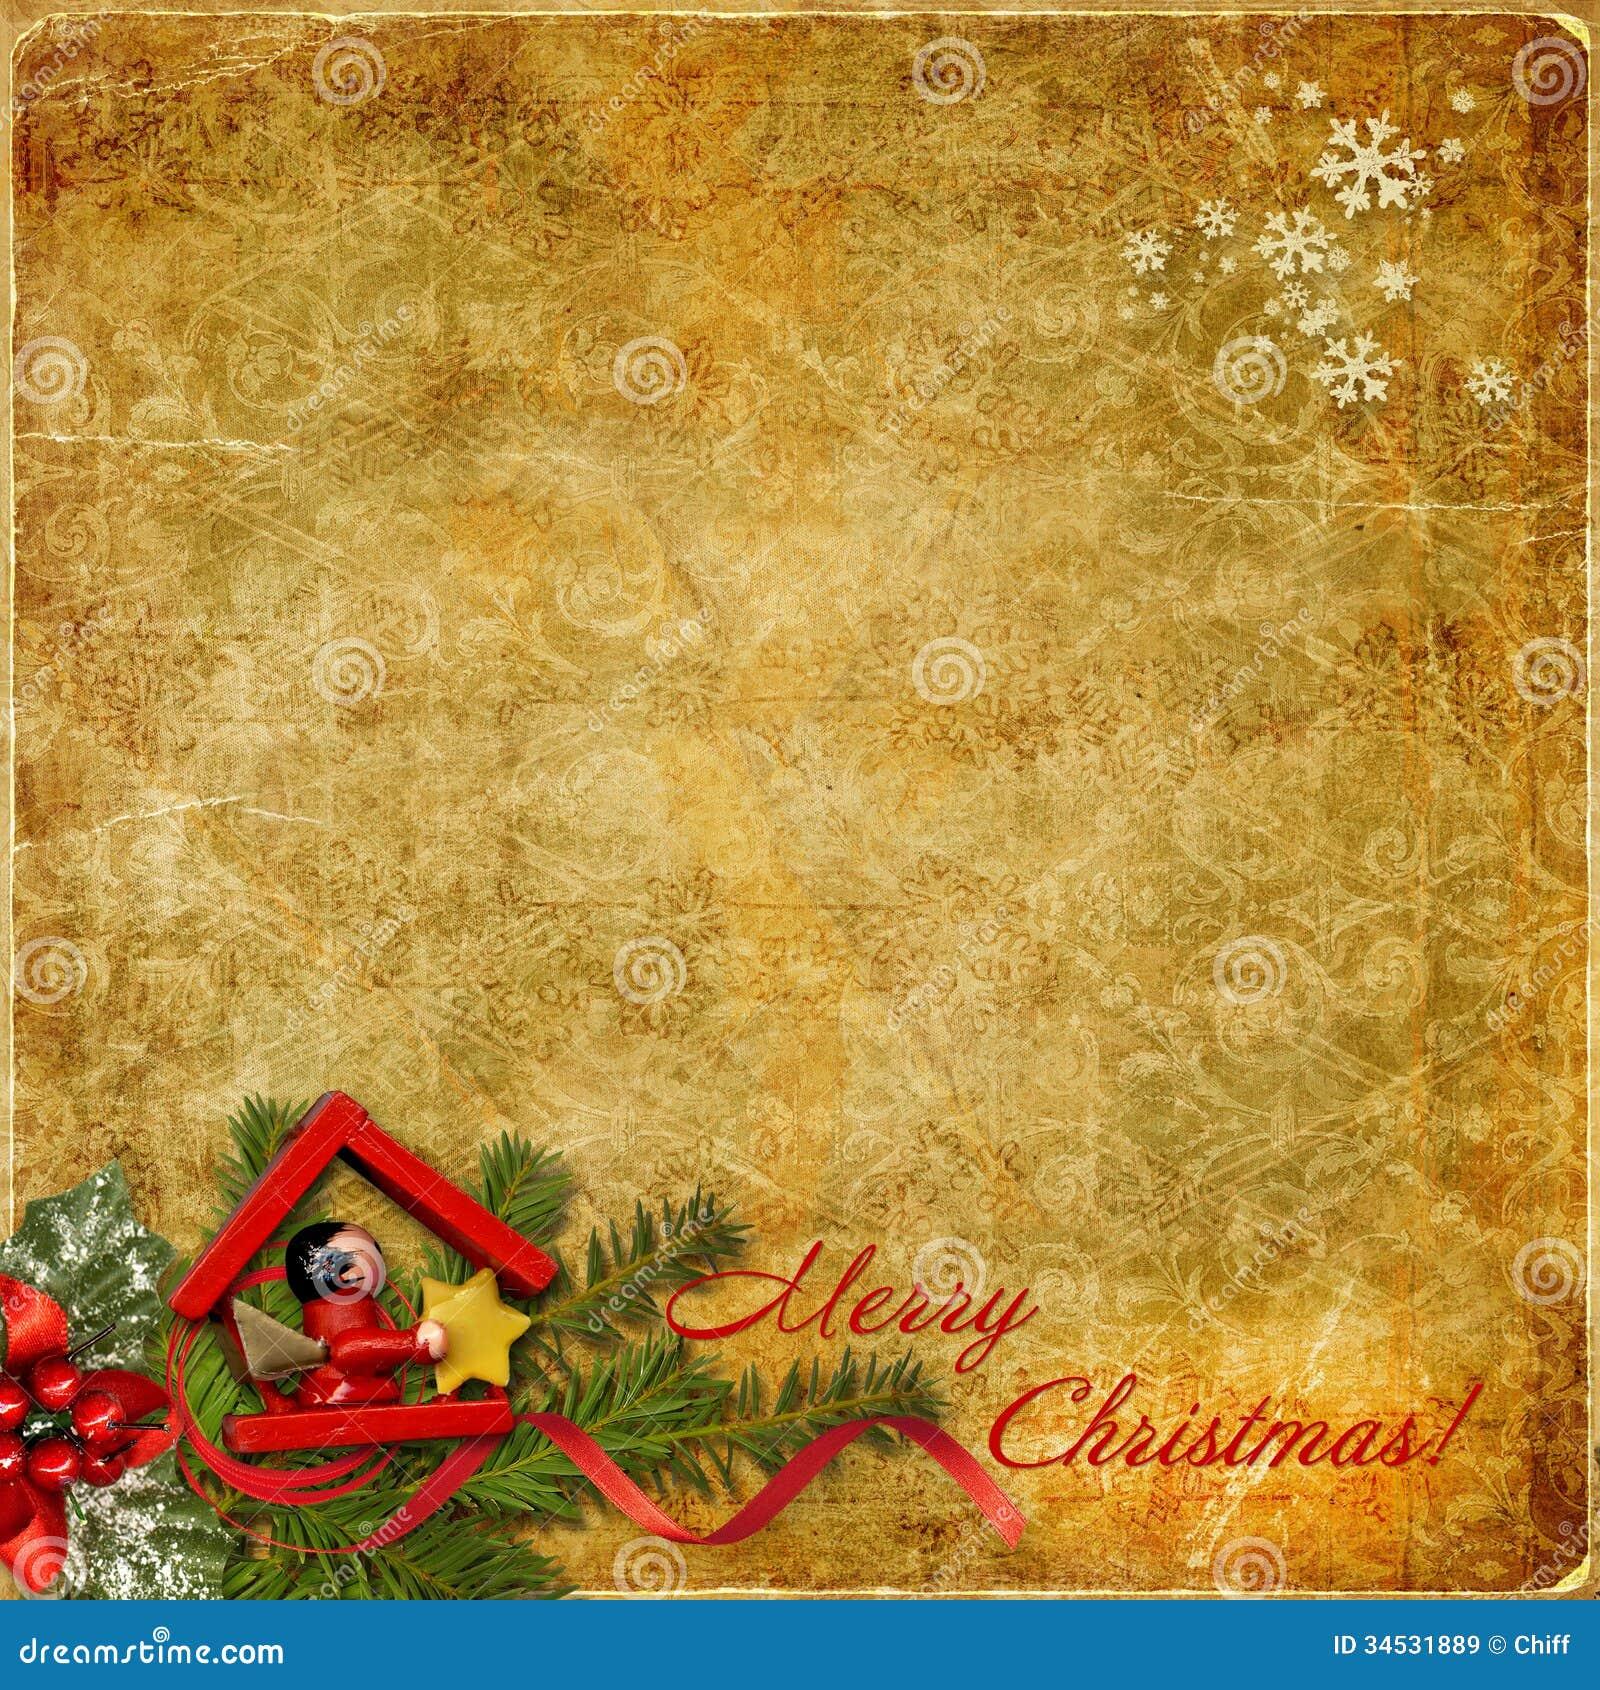 Vintage Christmas Background Stock Illustration - Image ...